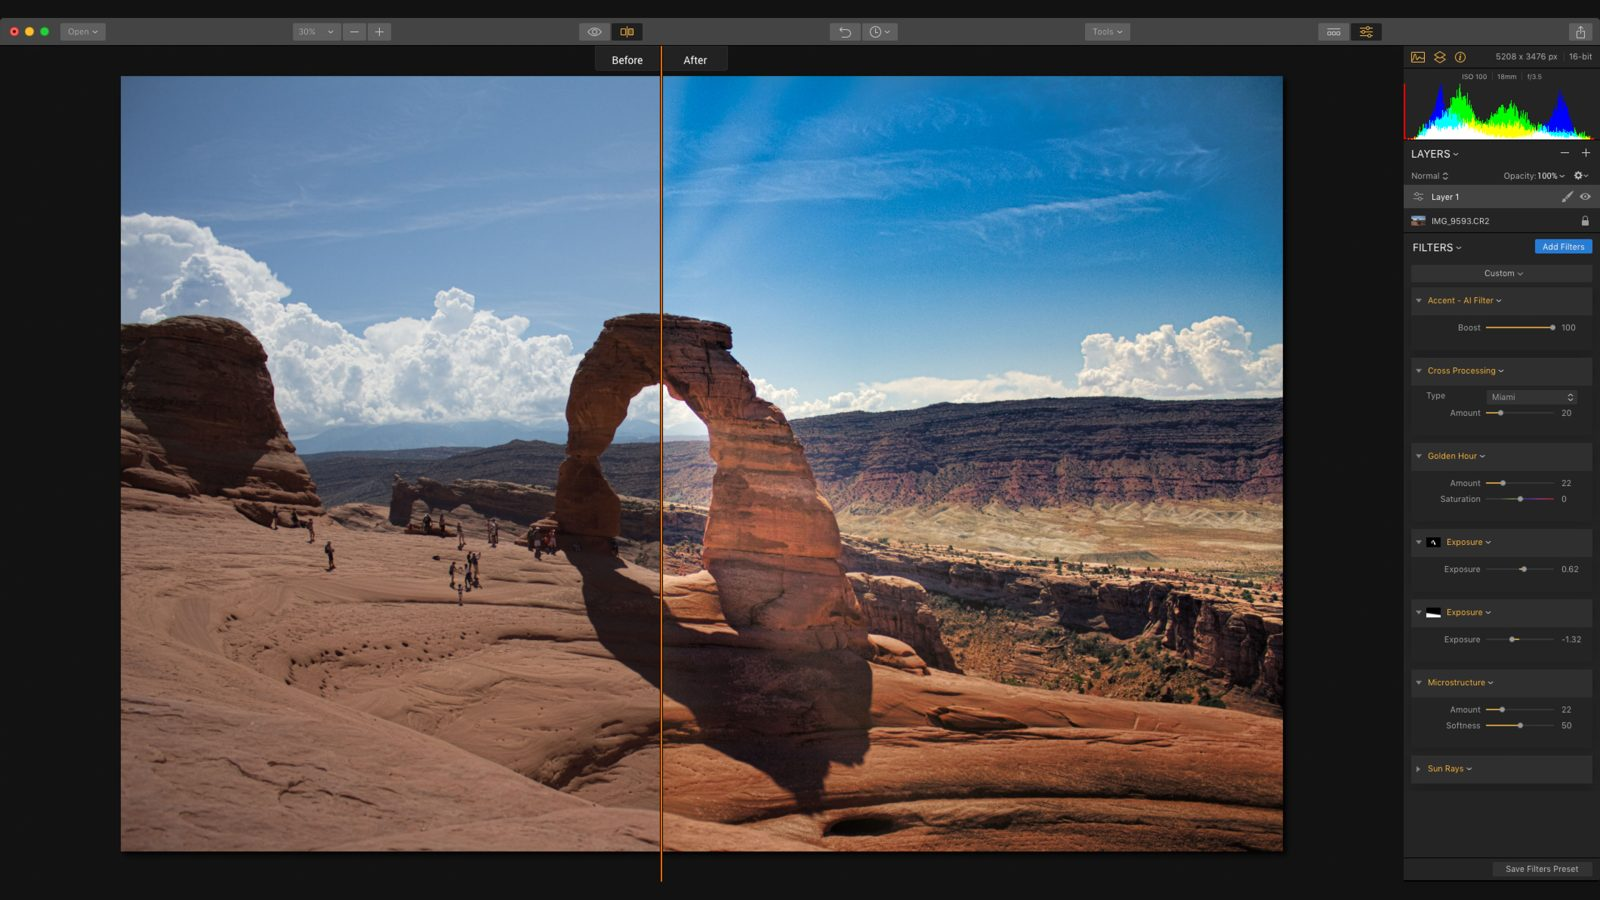 Macphun takes on Lightroom CC with improved Luminar 2018 photo